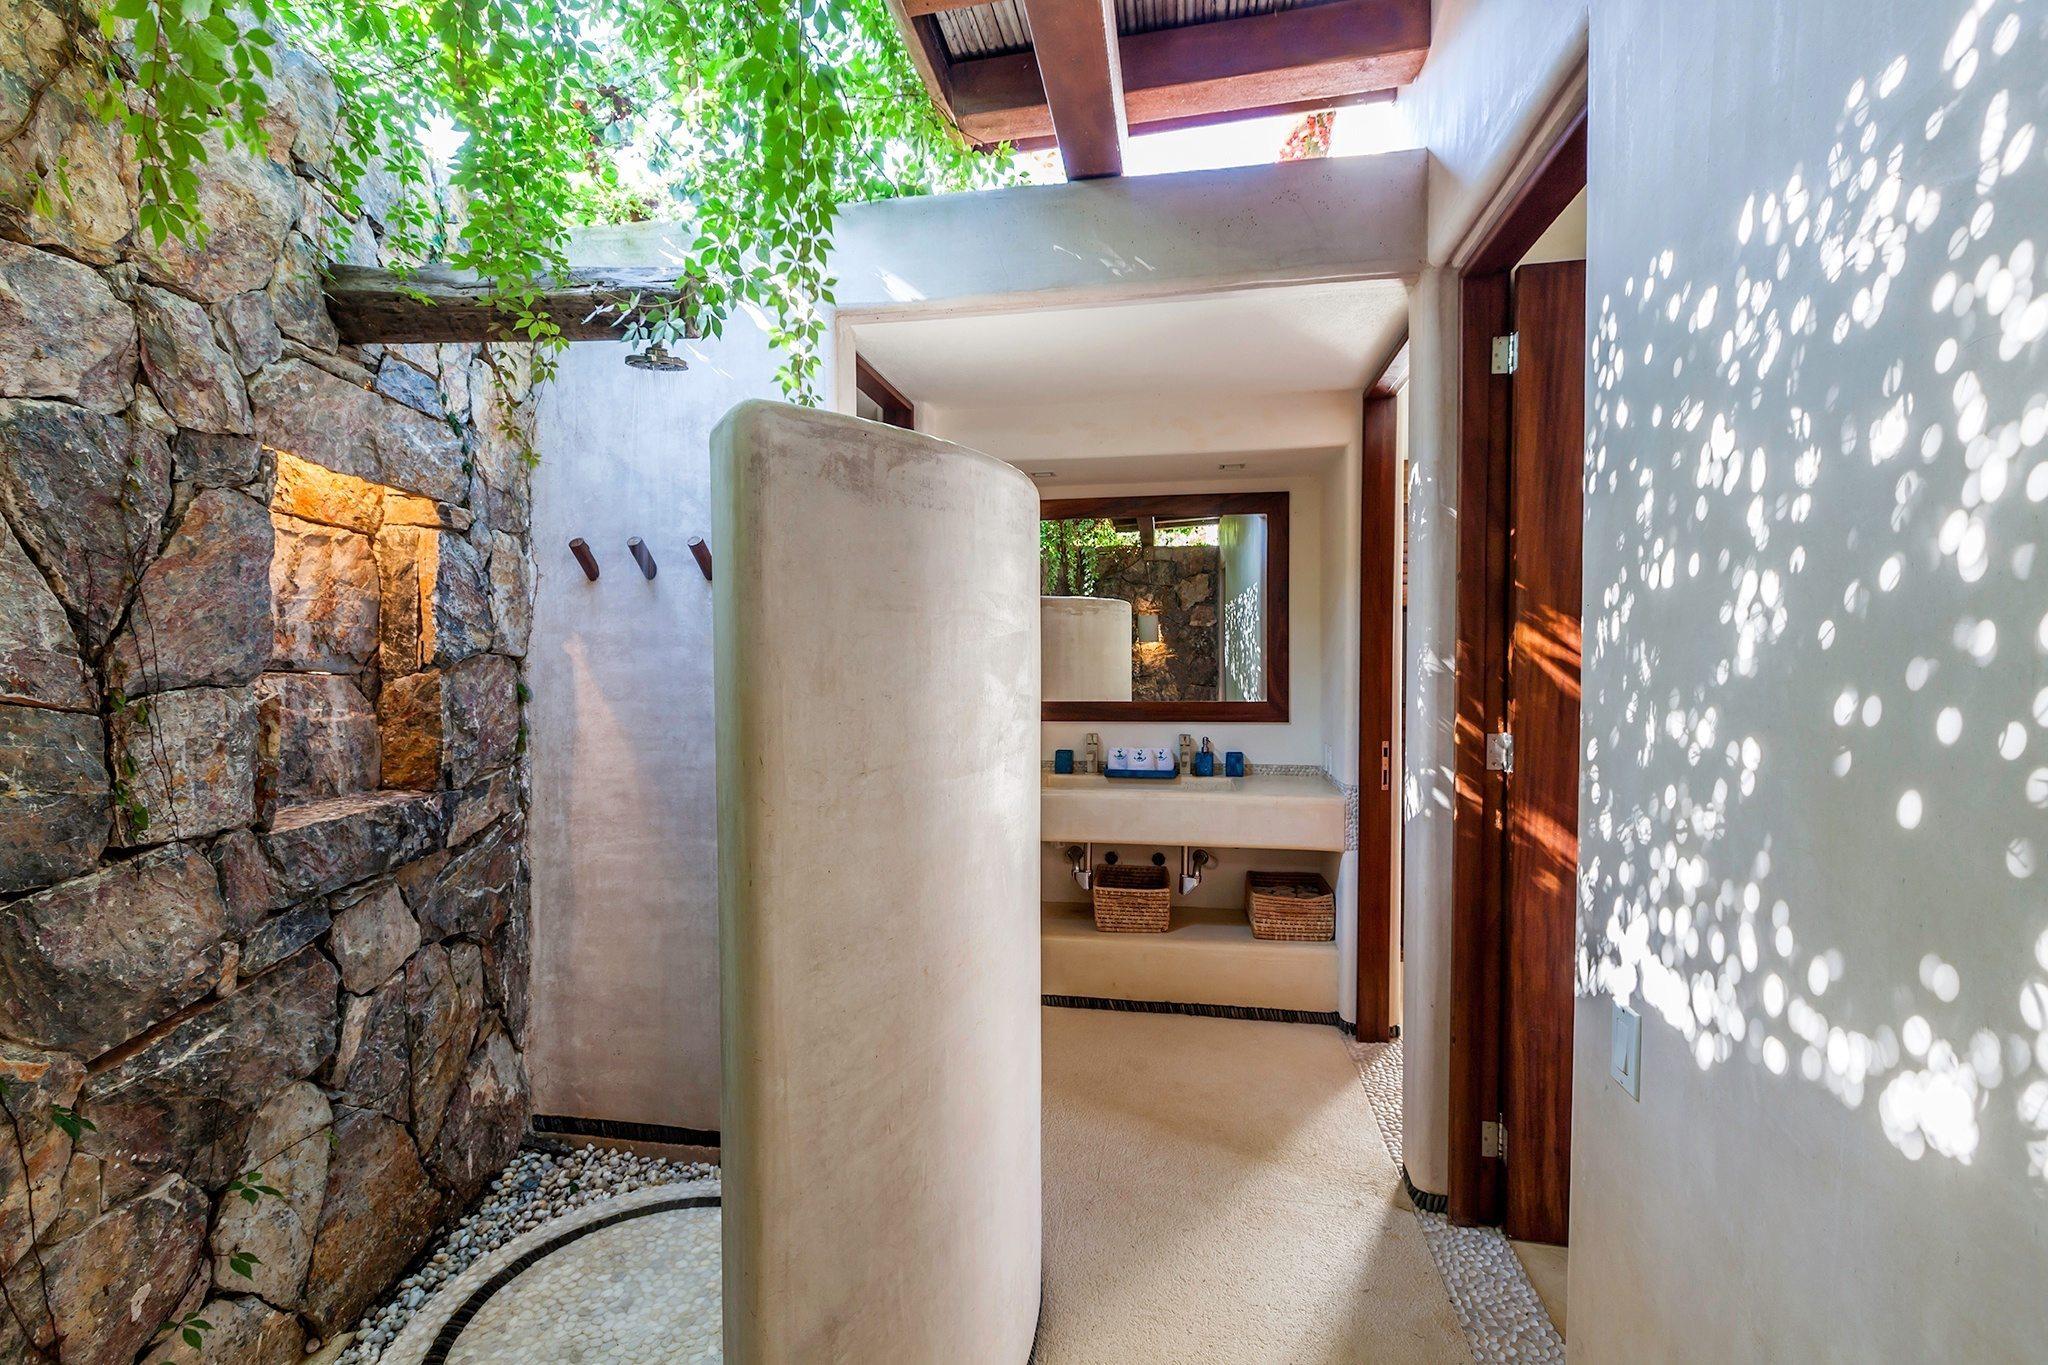 Garden Apartment Outdoor Shower